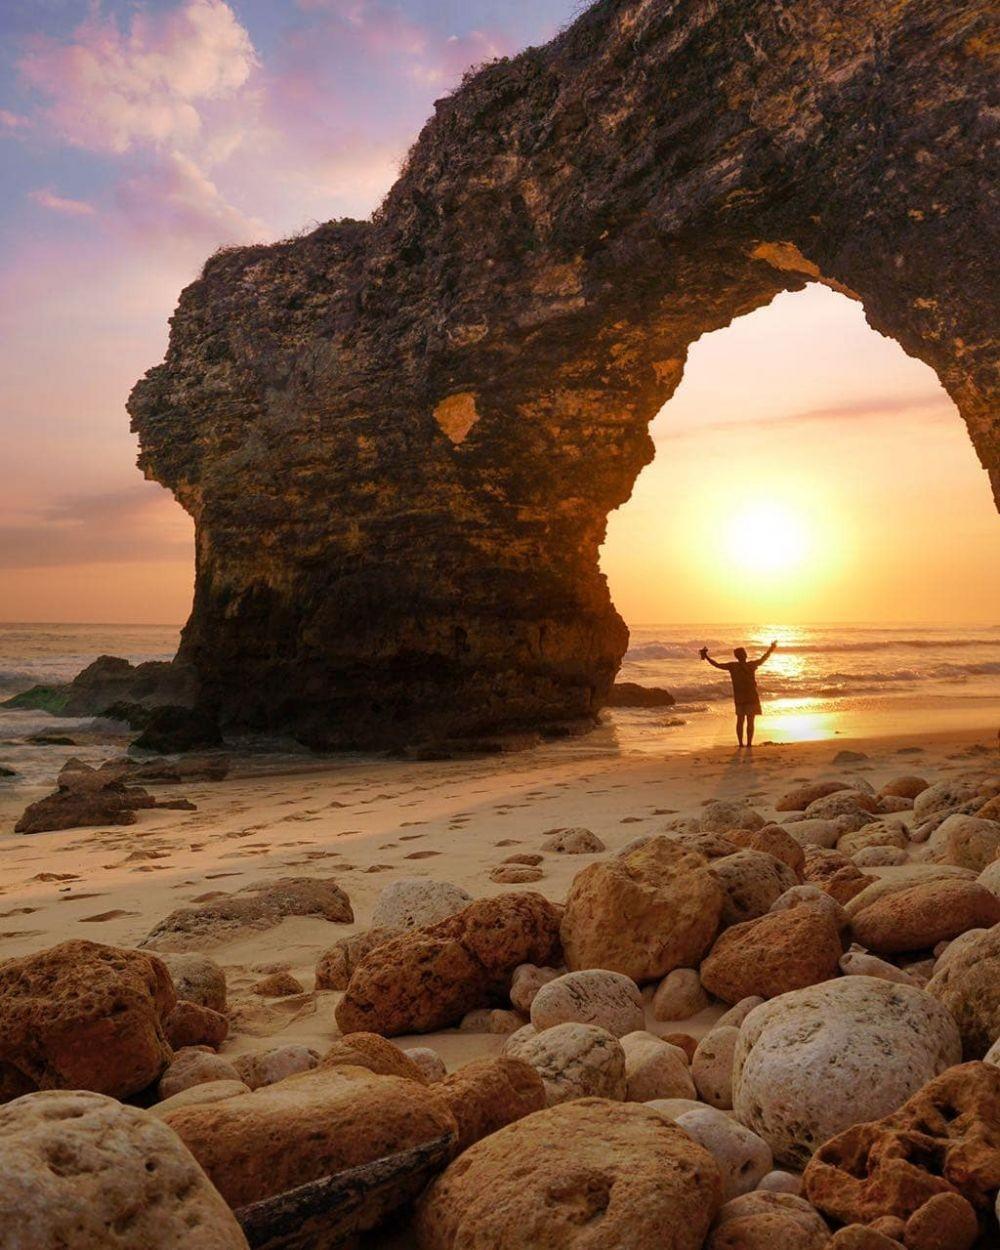 sunset gapura laut pantai mbawana